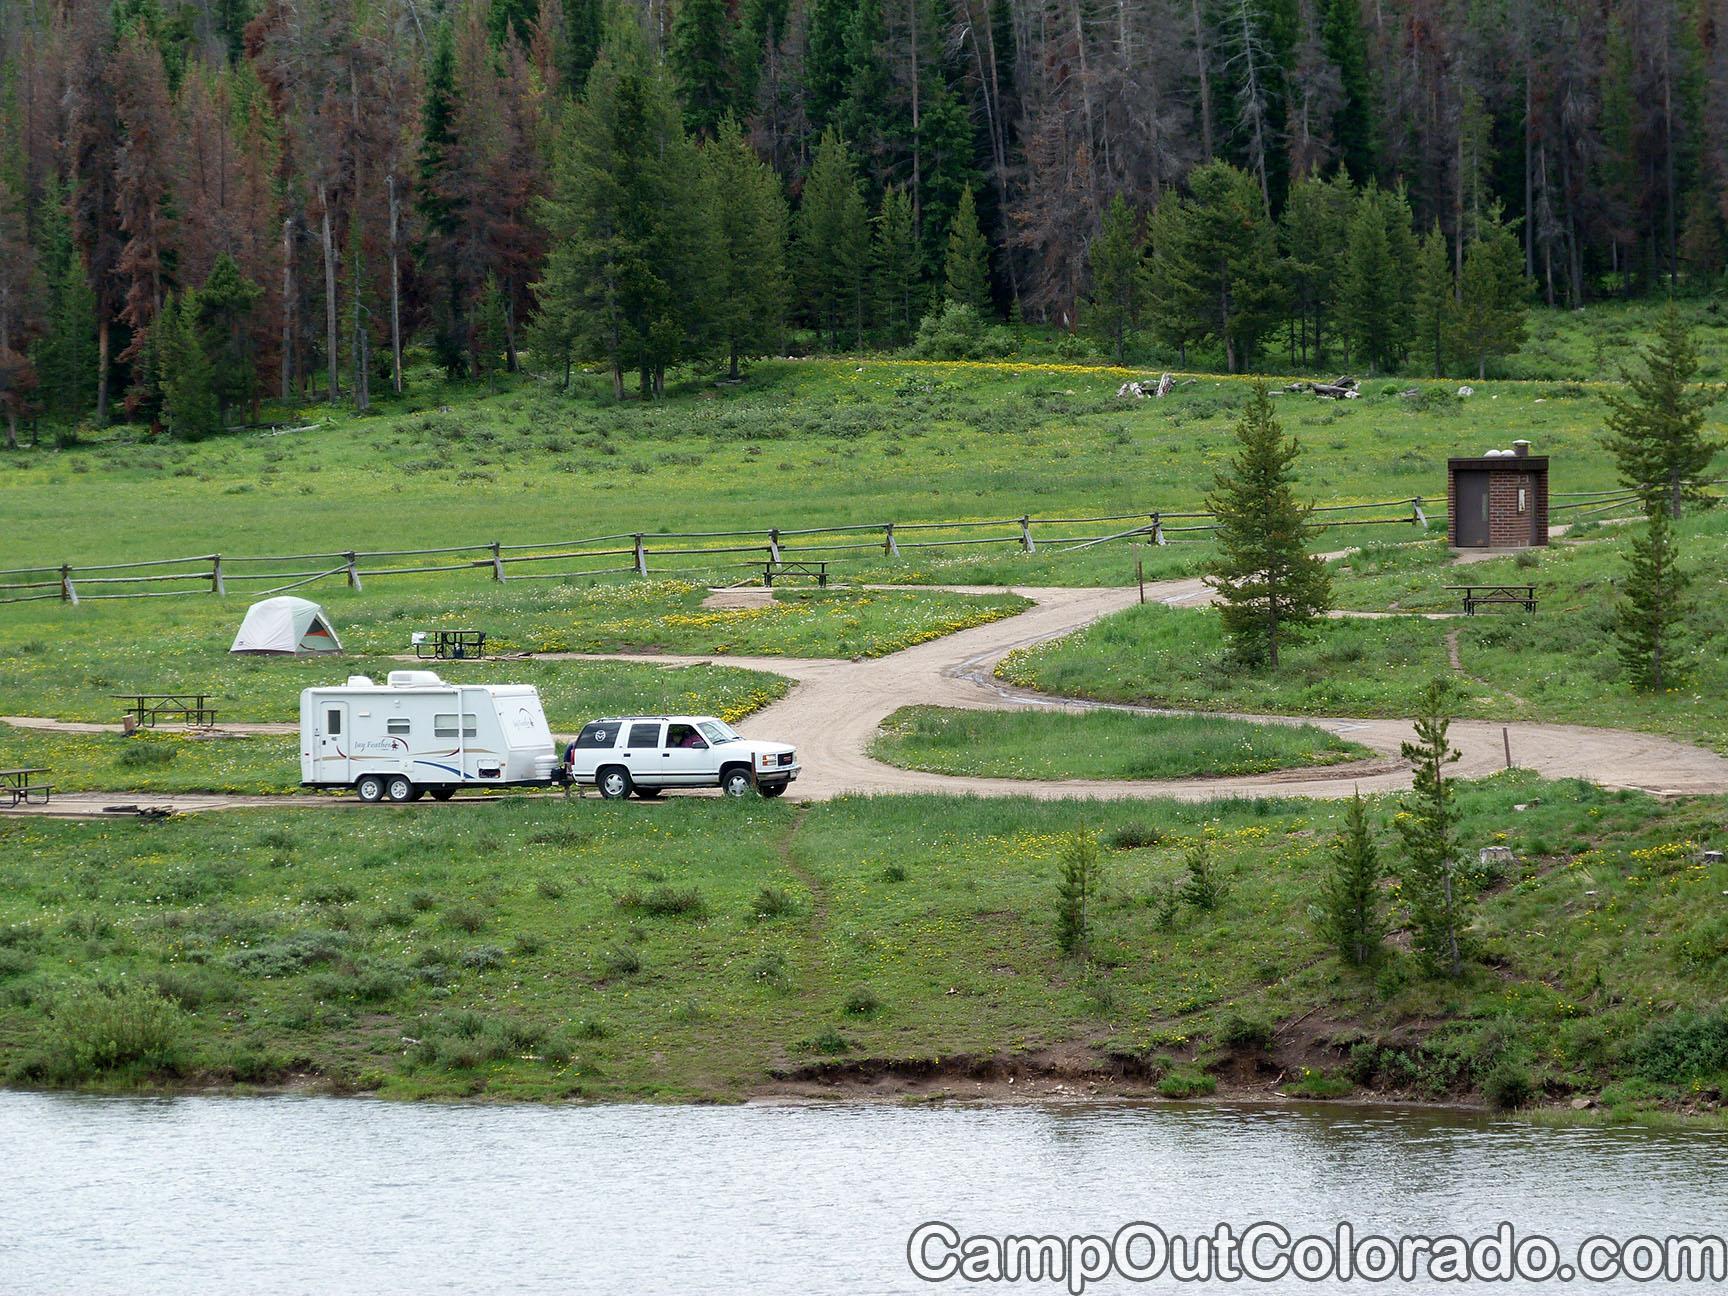 Campoutcolorado-north-michigan-reservoir-campground-southeast-camping